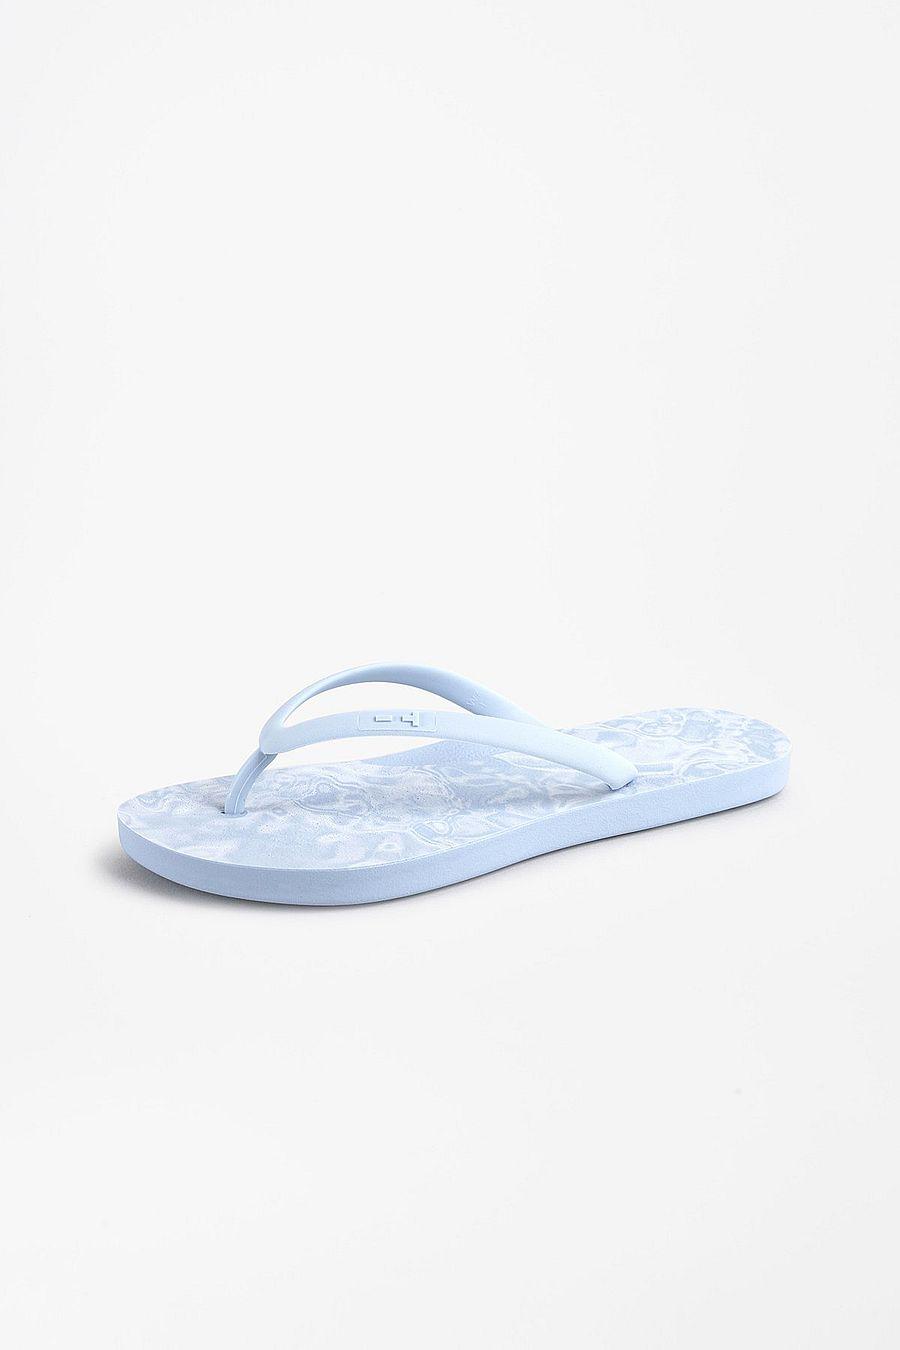 Tidal TIDE Flip Flops - Sky Blue